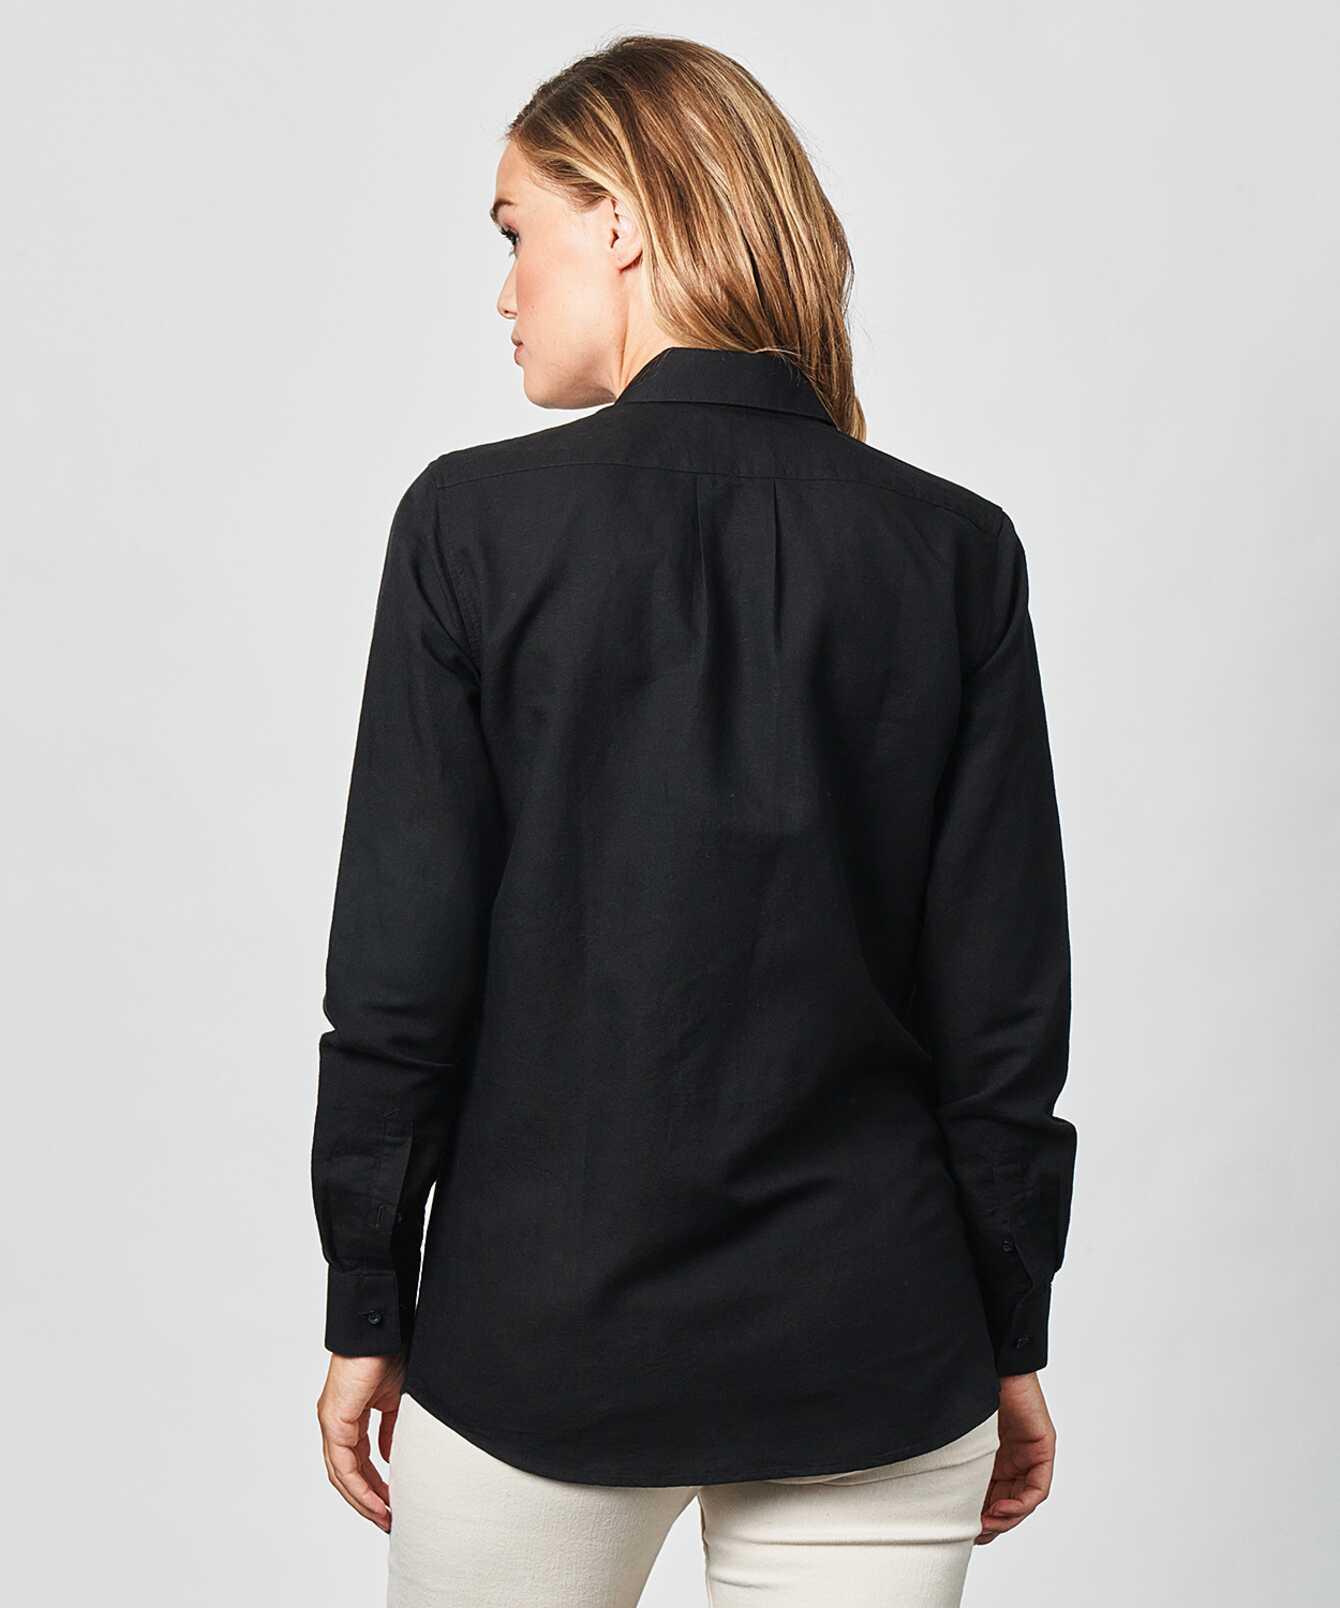 Shirt Mickan Portofino Black The Shirt Factory